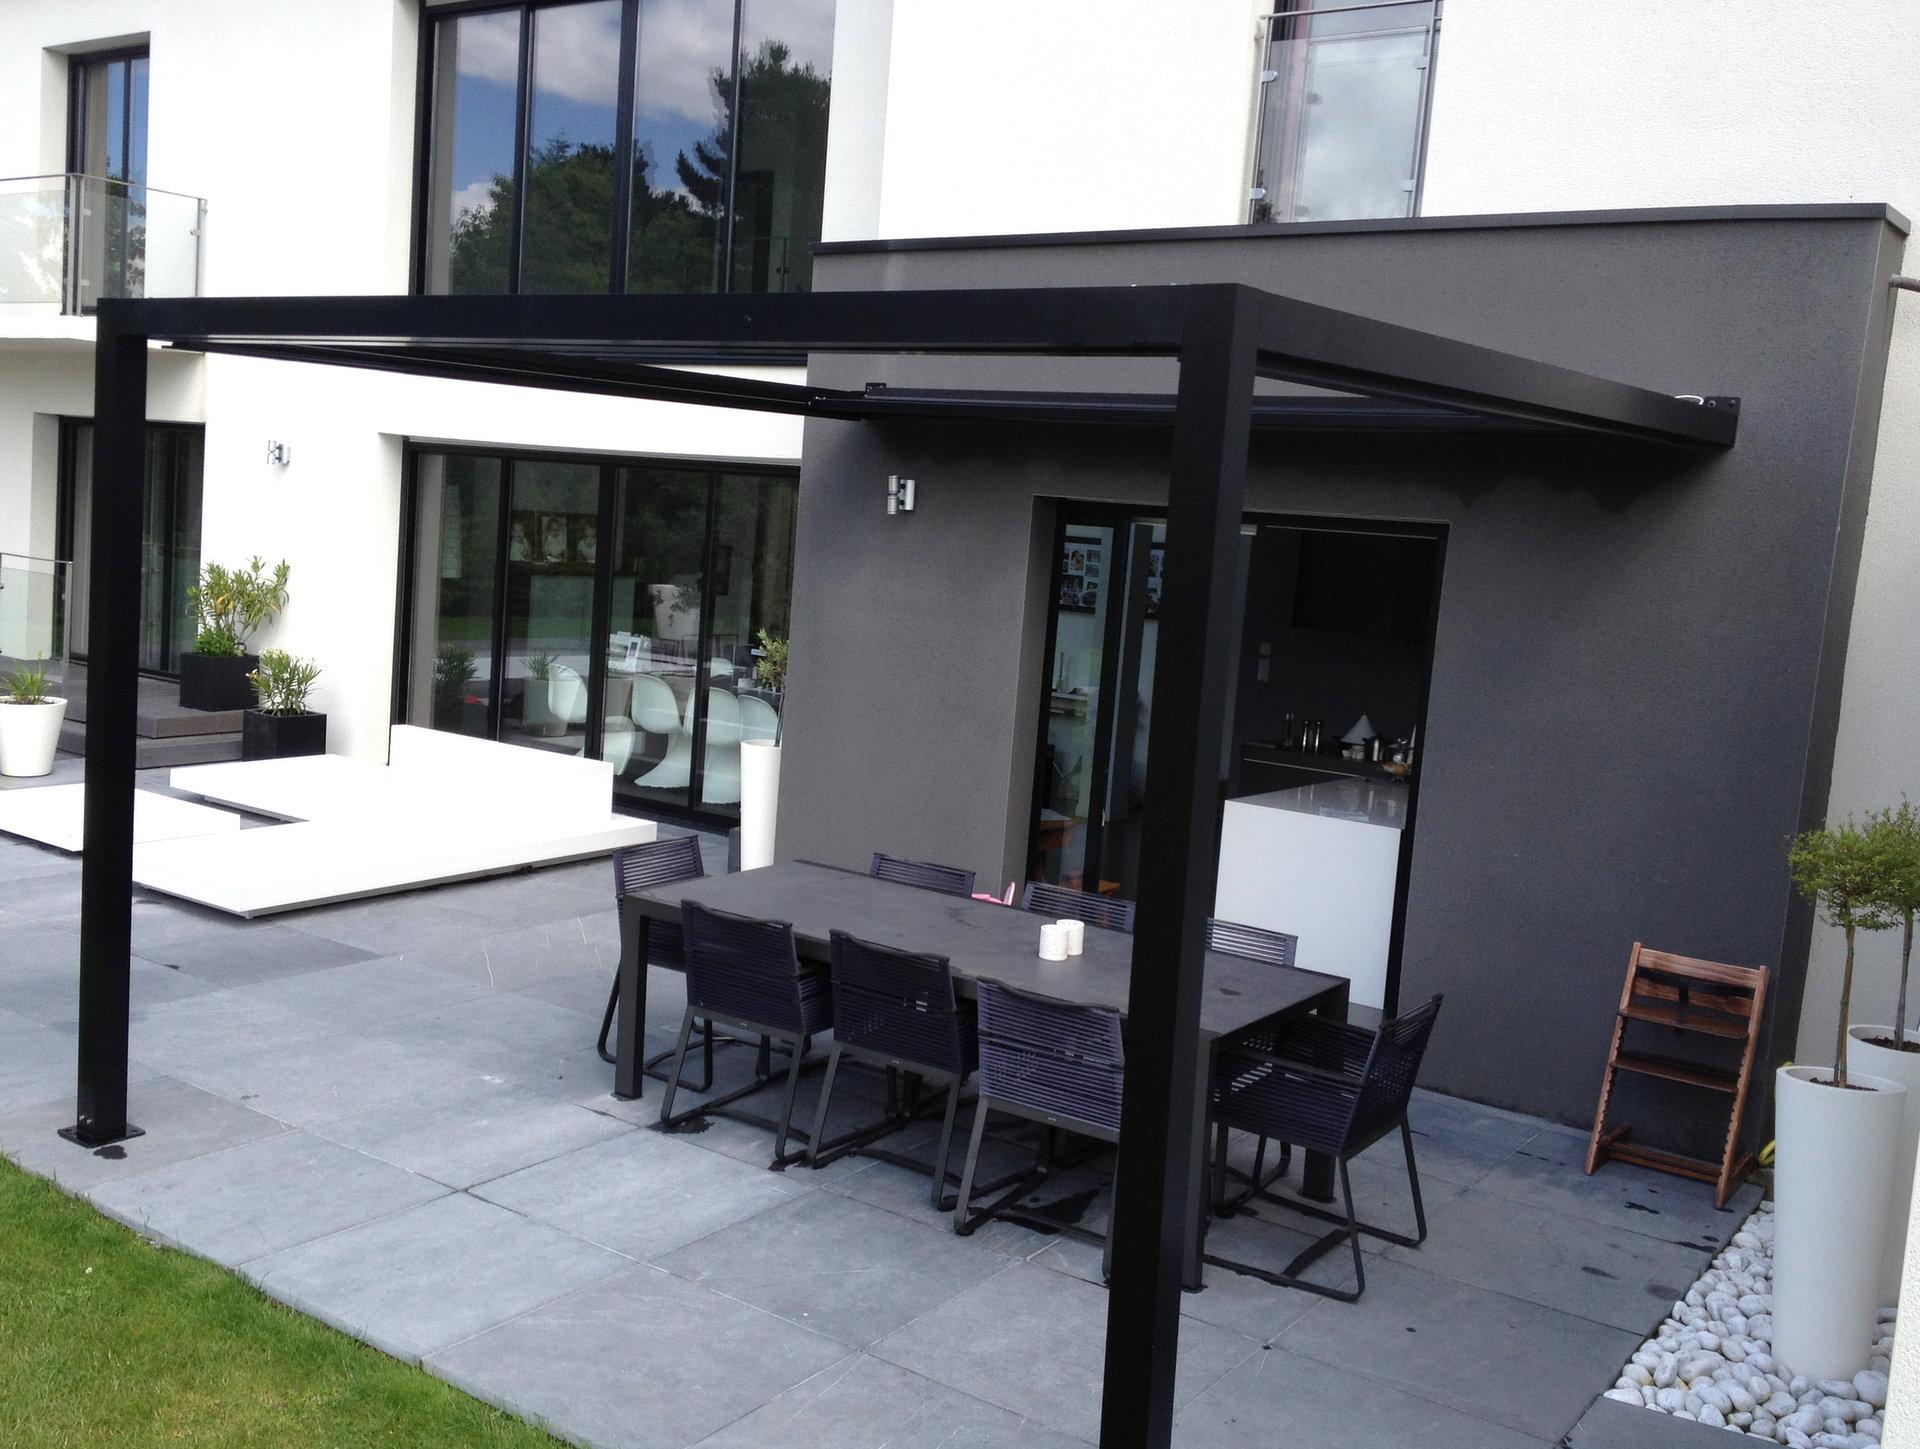 Ideea terrasse - Modèle ID2 Design